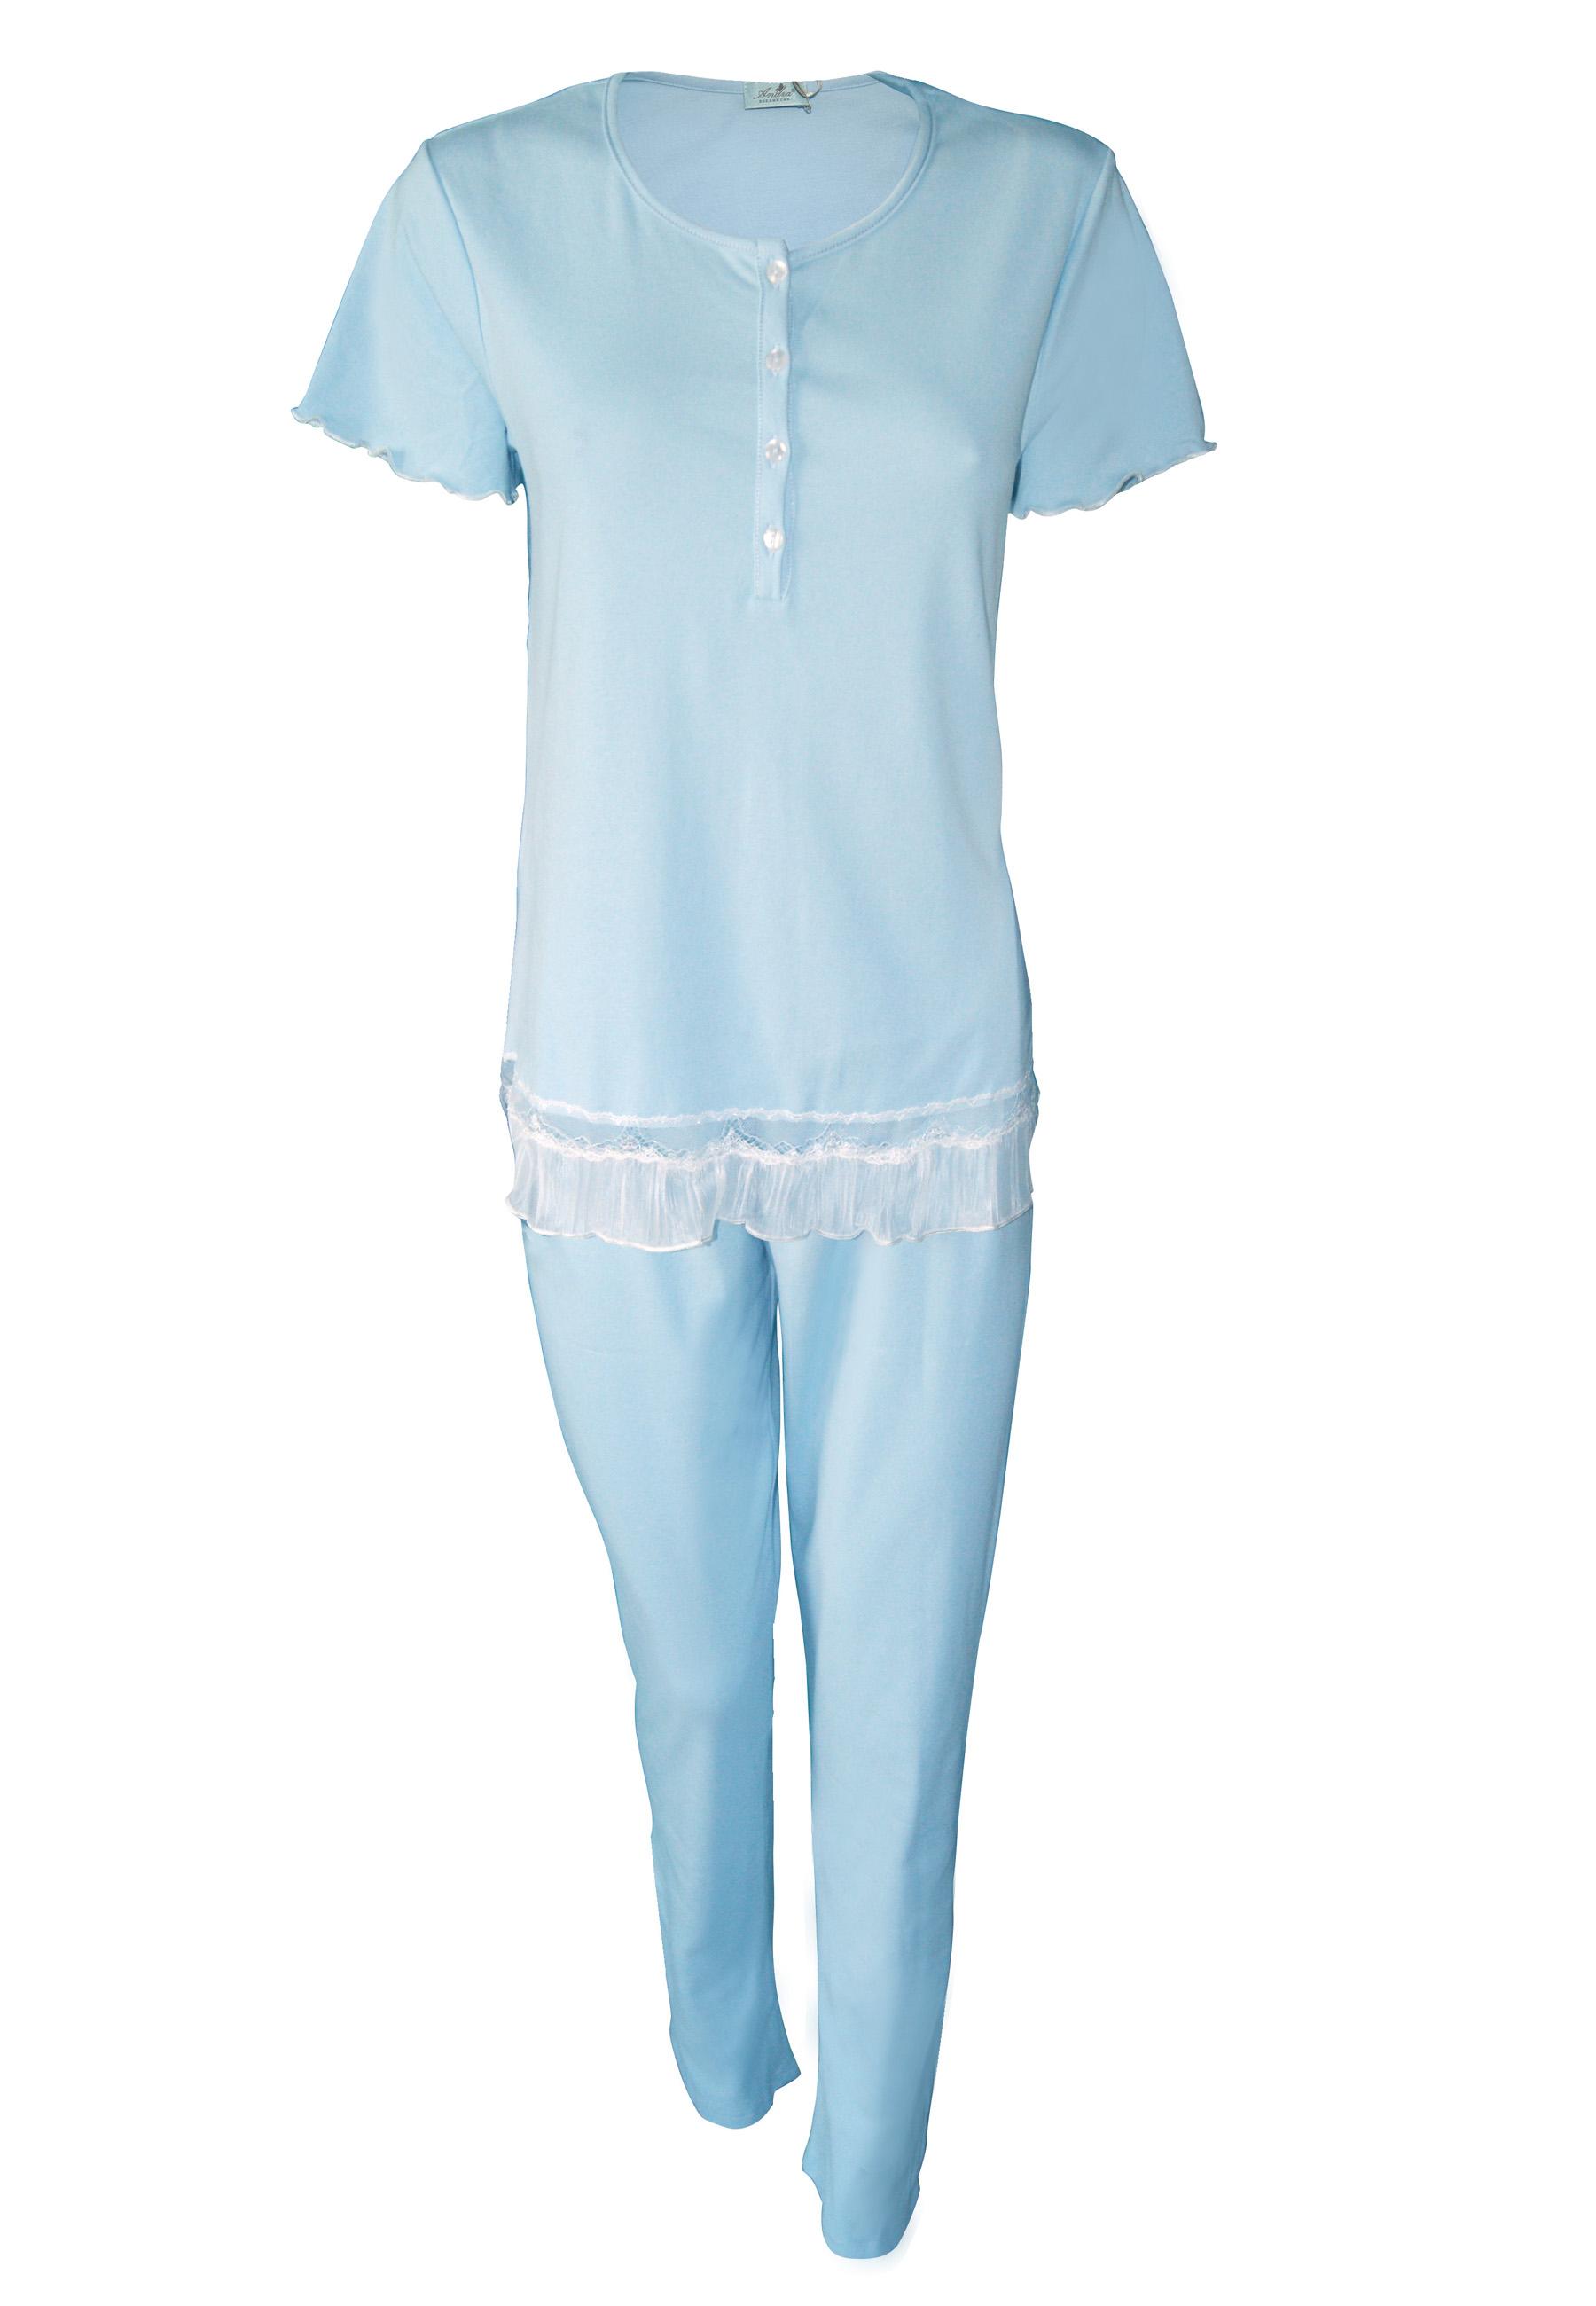 ea27fd4f562 Γυναικεία καλοκαιρινή πυτζάμα με κοντό μανίκι και μακρύ παντελόνι γαλάζιο  made in ...